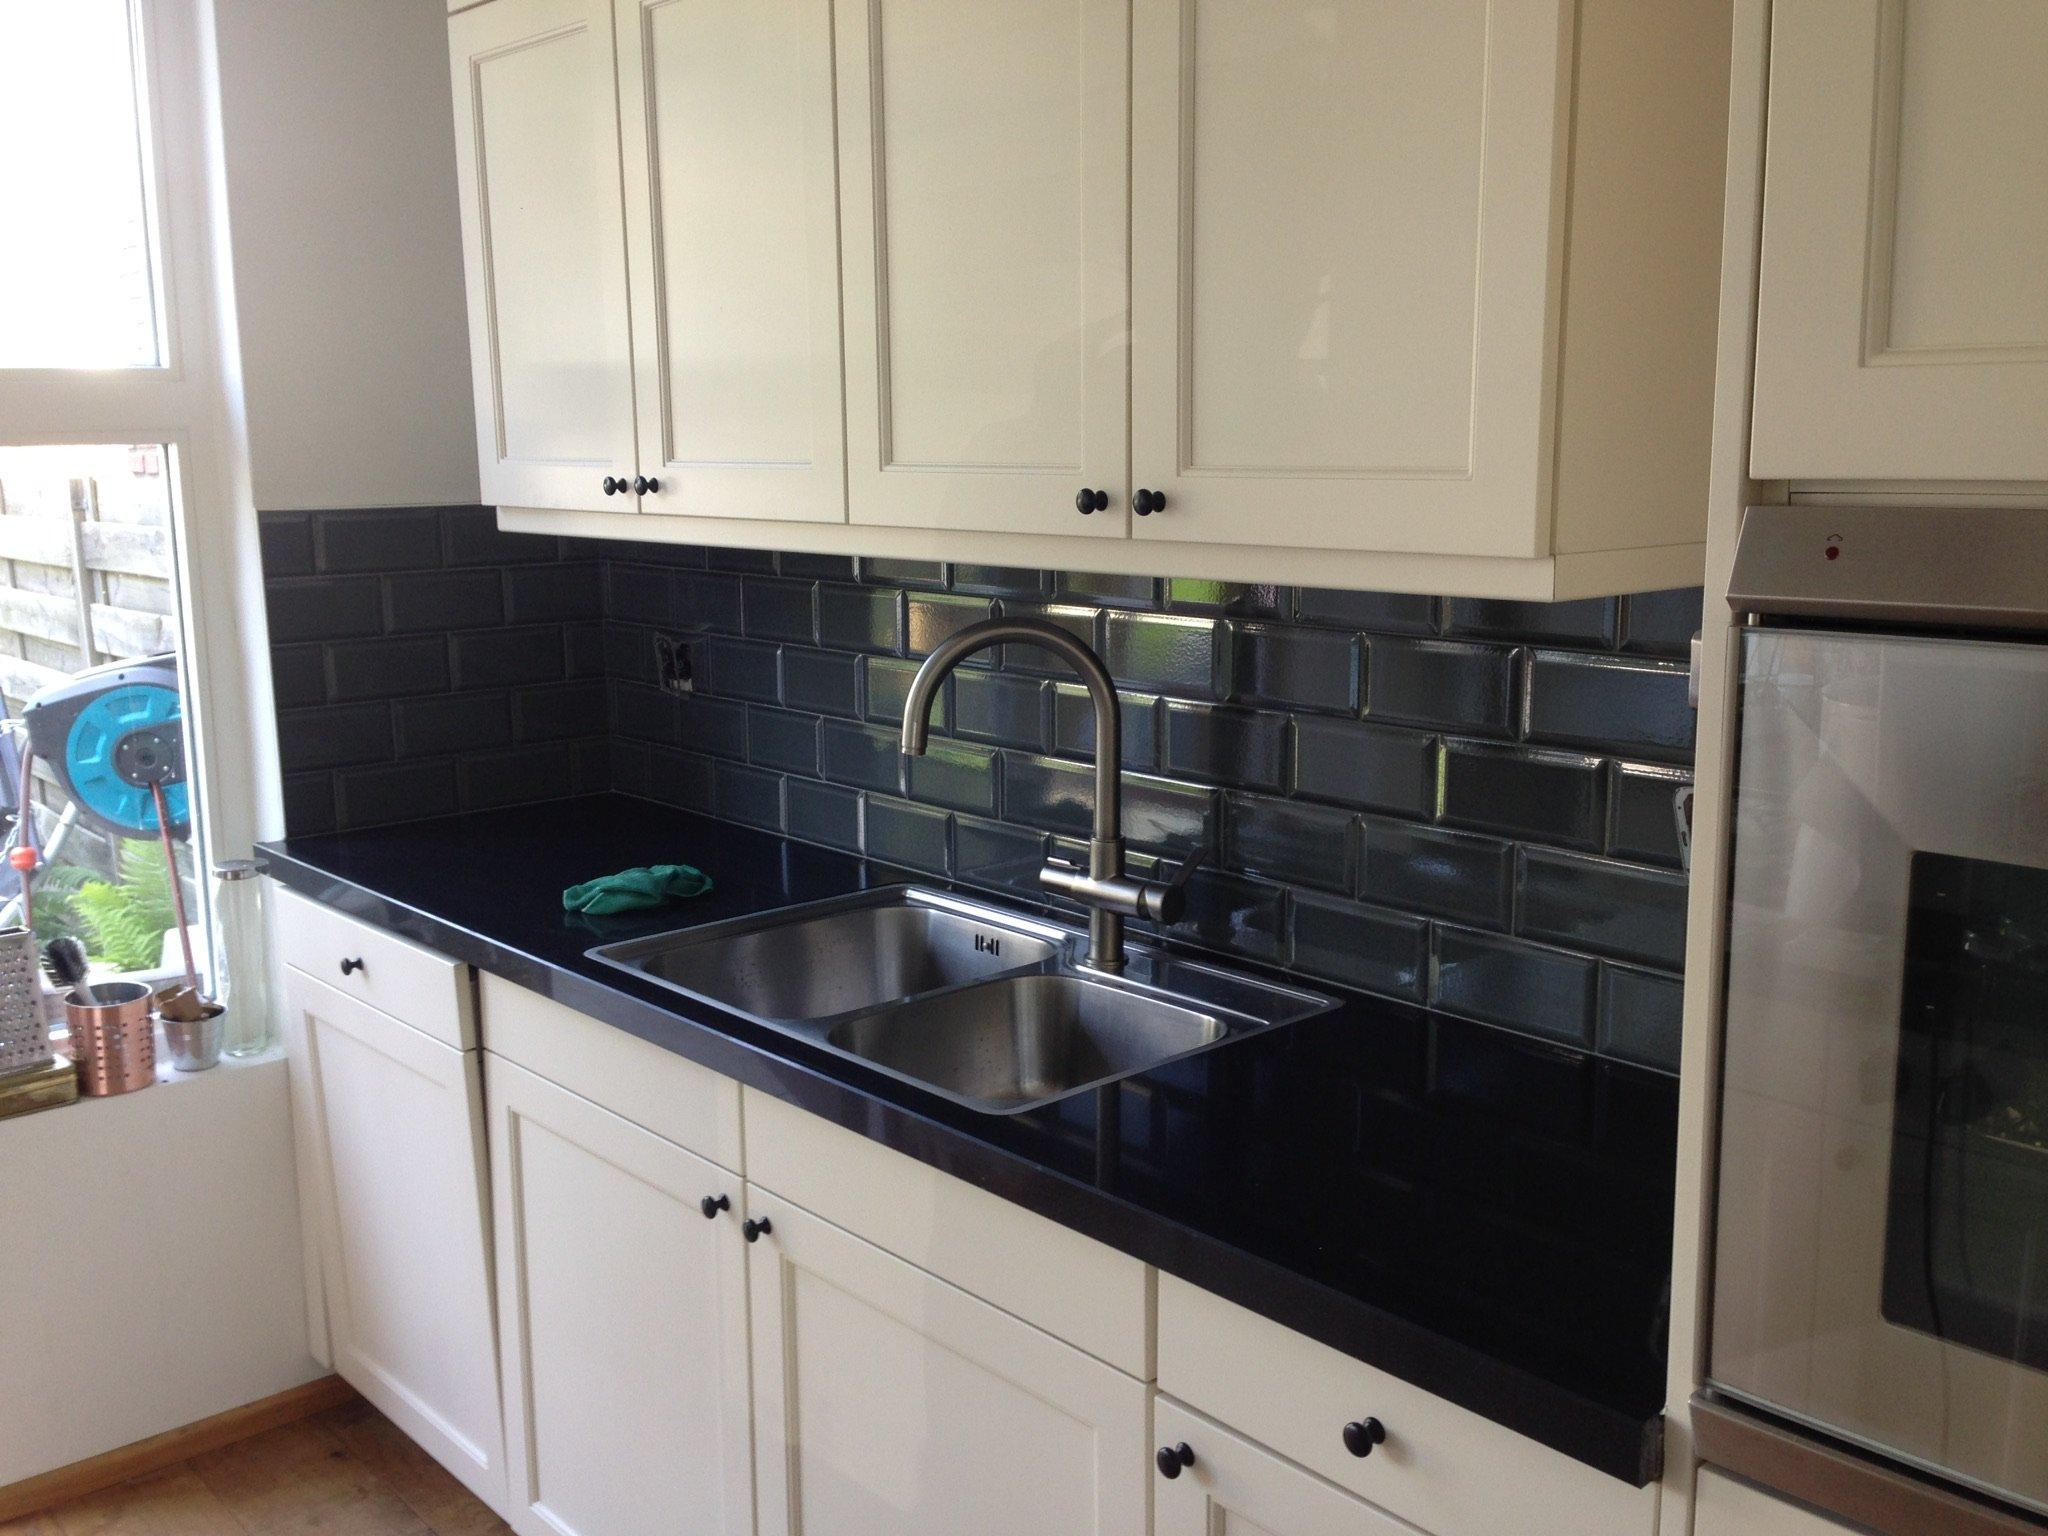 Wasbak 1 Meter : Muur betegelen achter wasbak keuken m werkspot